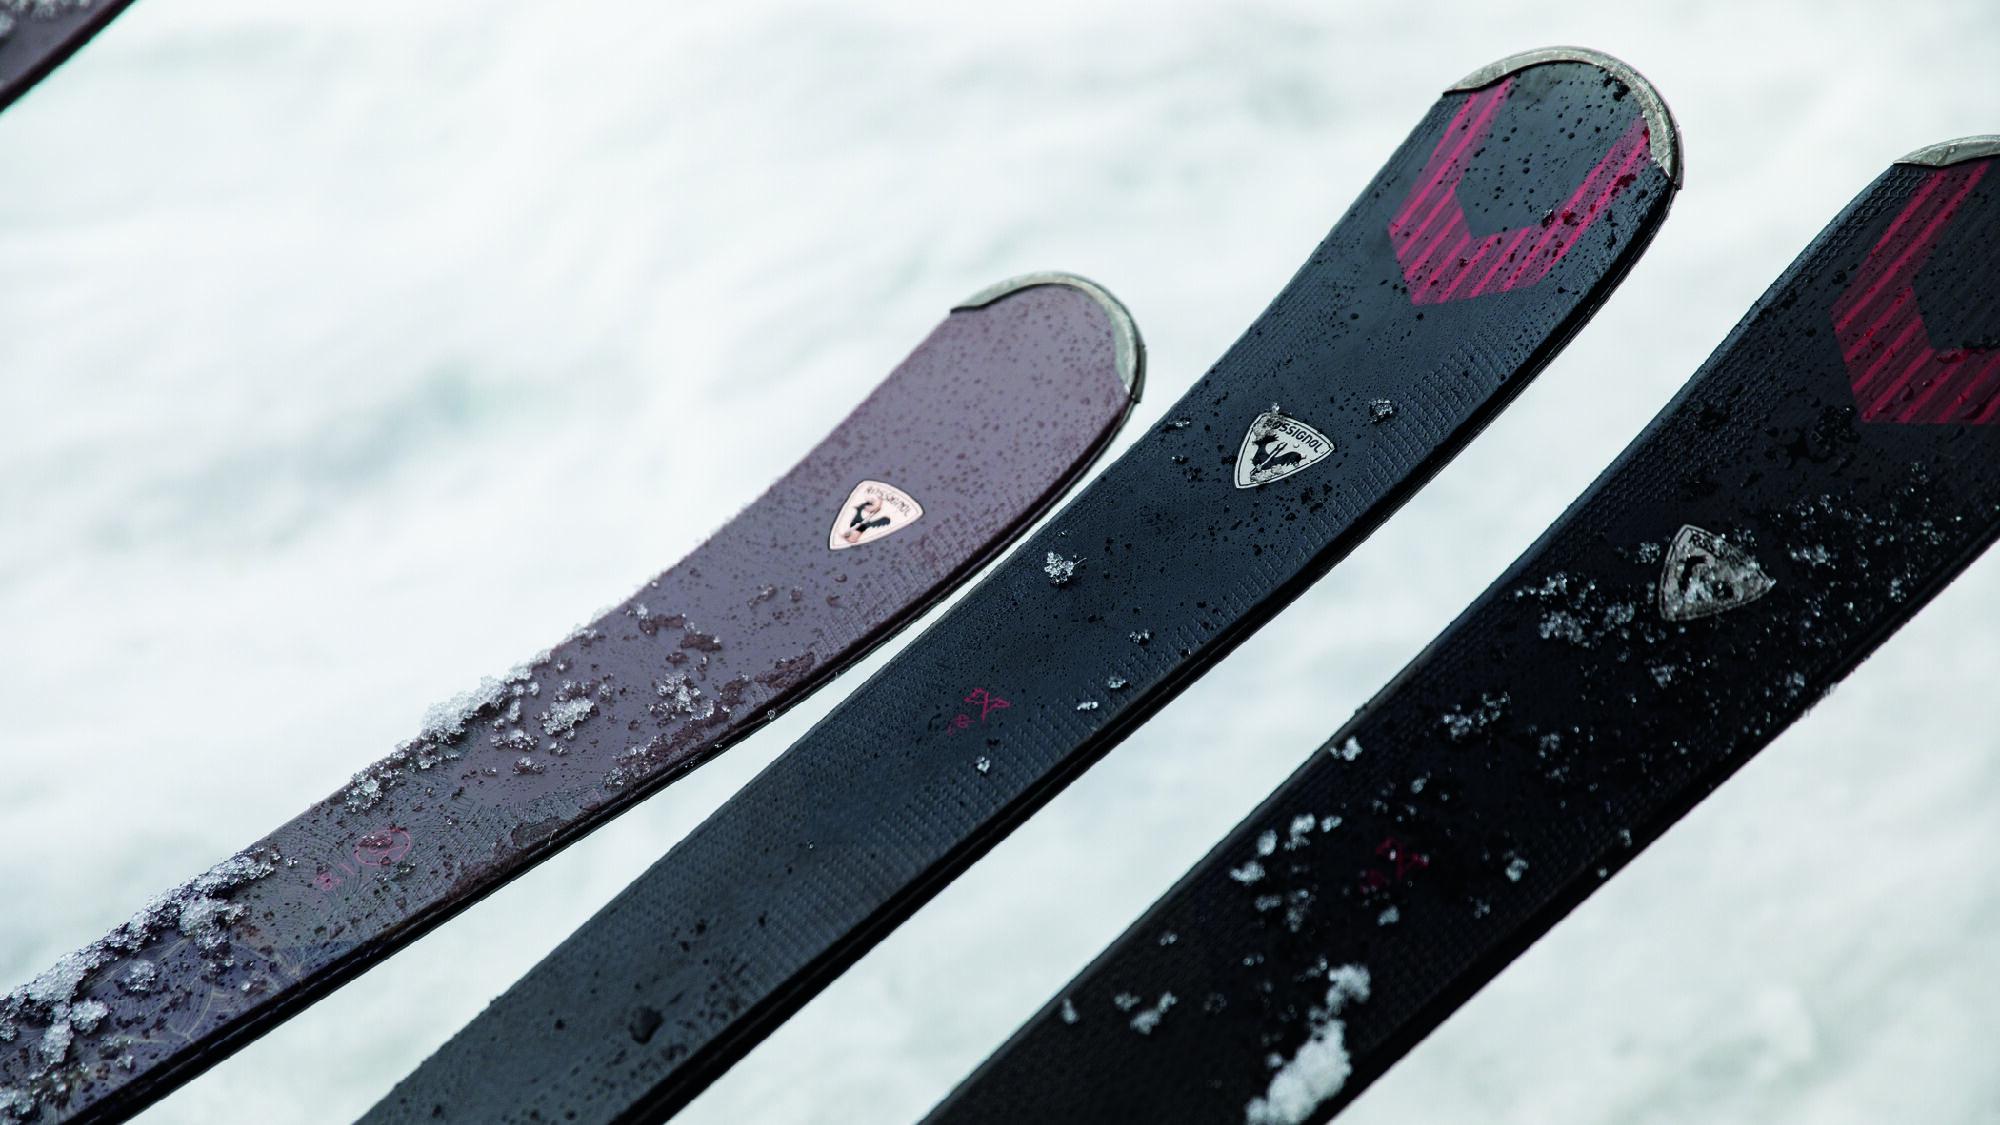 Rossignol Ski Neuheiten 2021/2022